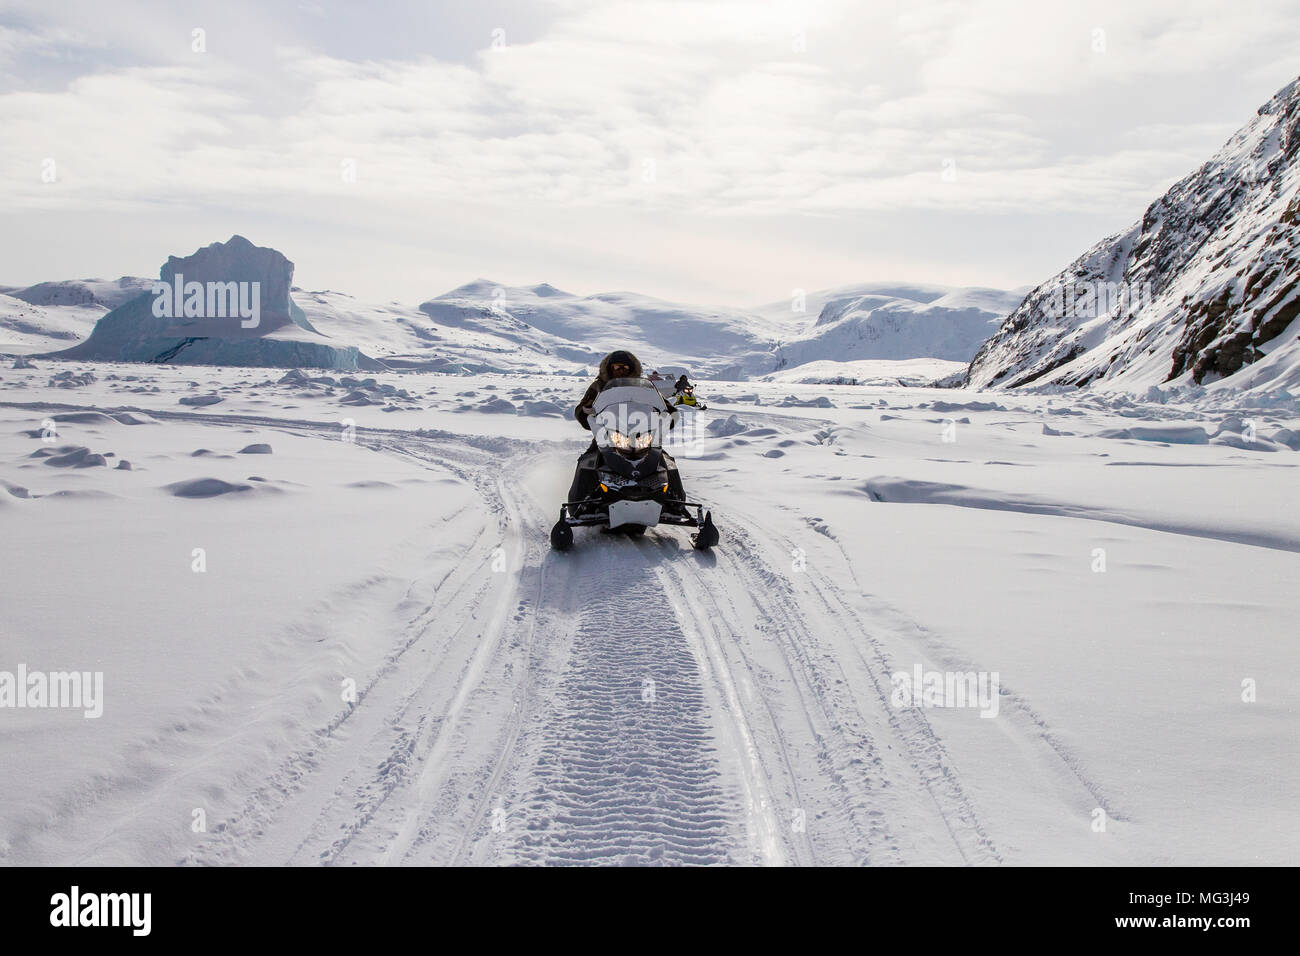 Solitary ski doo rides over a frozen fjord.  Baffin Island, Nunavut, Canada, arctic - Stock Image